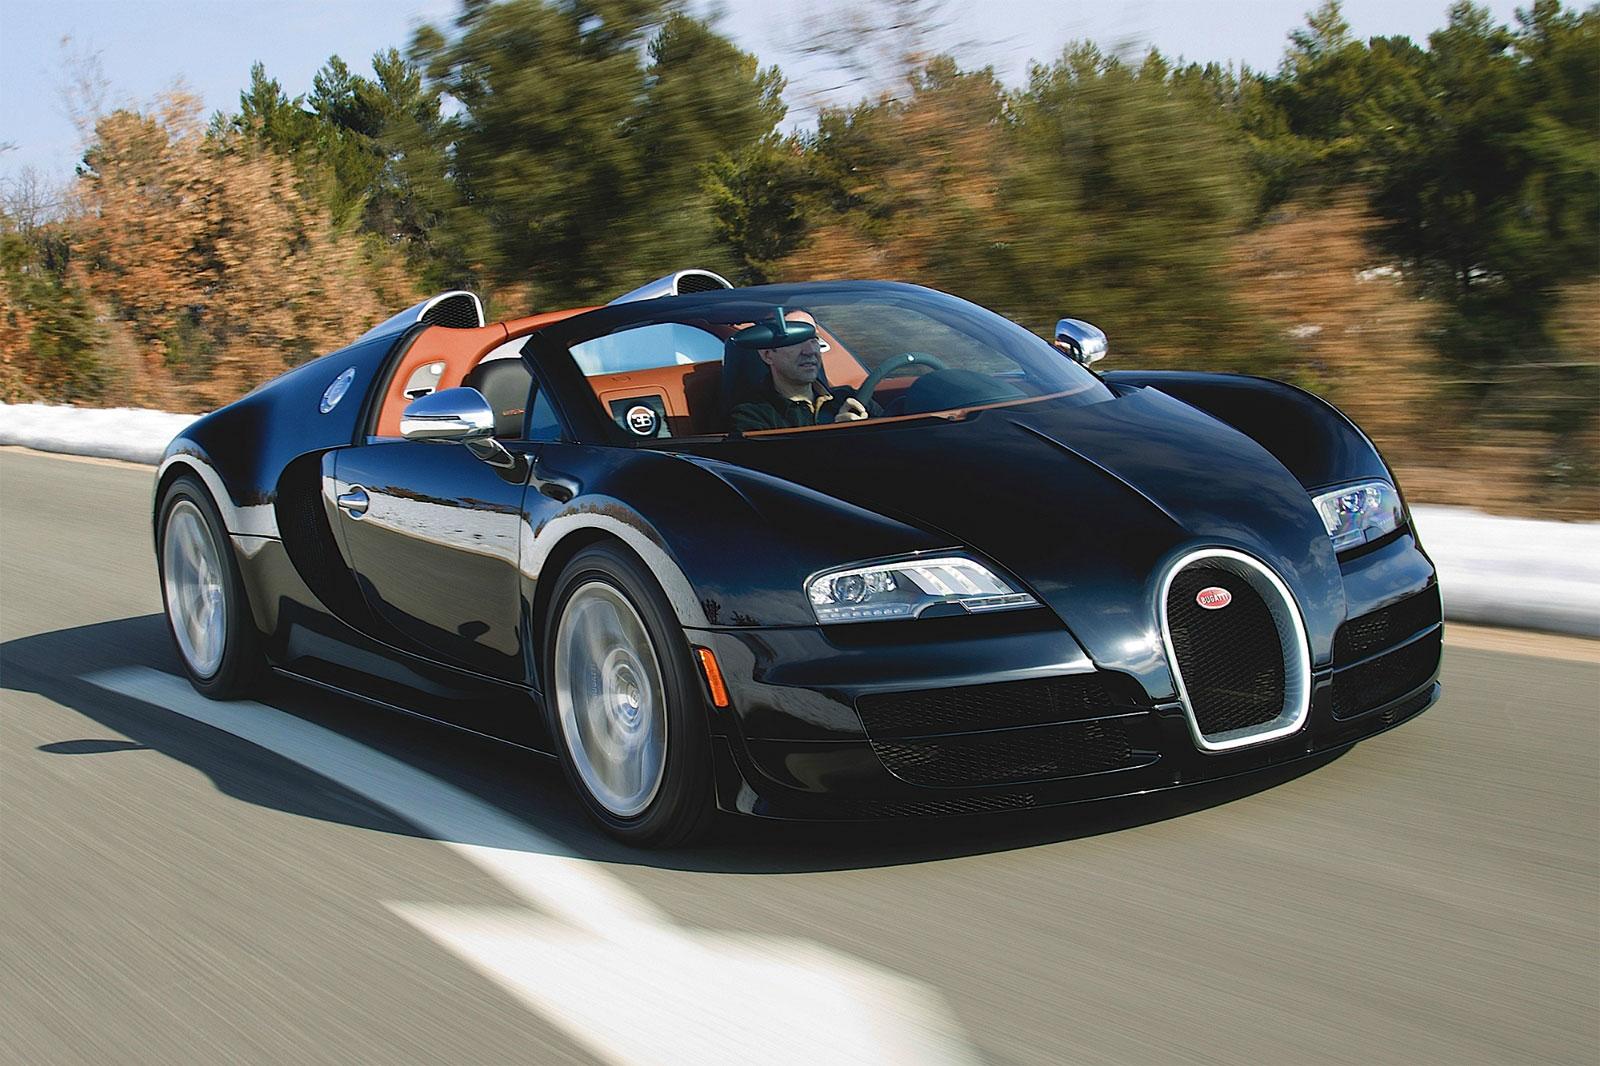 sport cars bugatti veyron grand sport vitesse hd wallpapers 2012. Black Bedroom Furniture Sets. Home Design Ideas